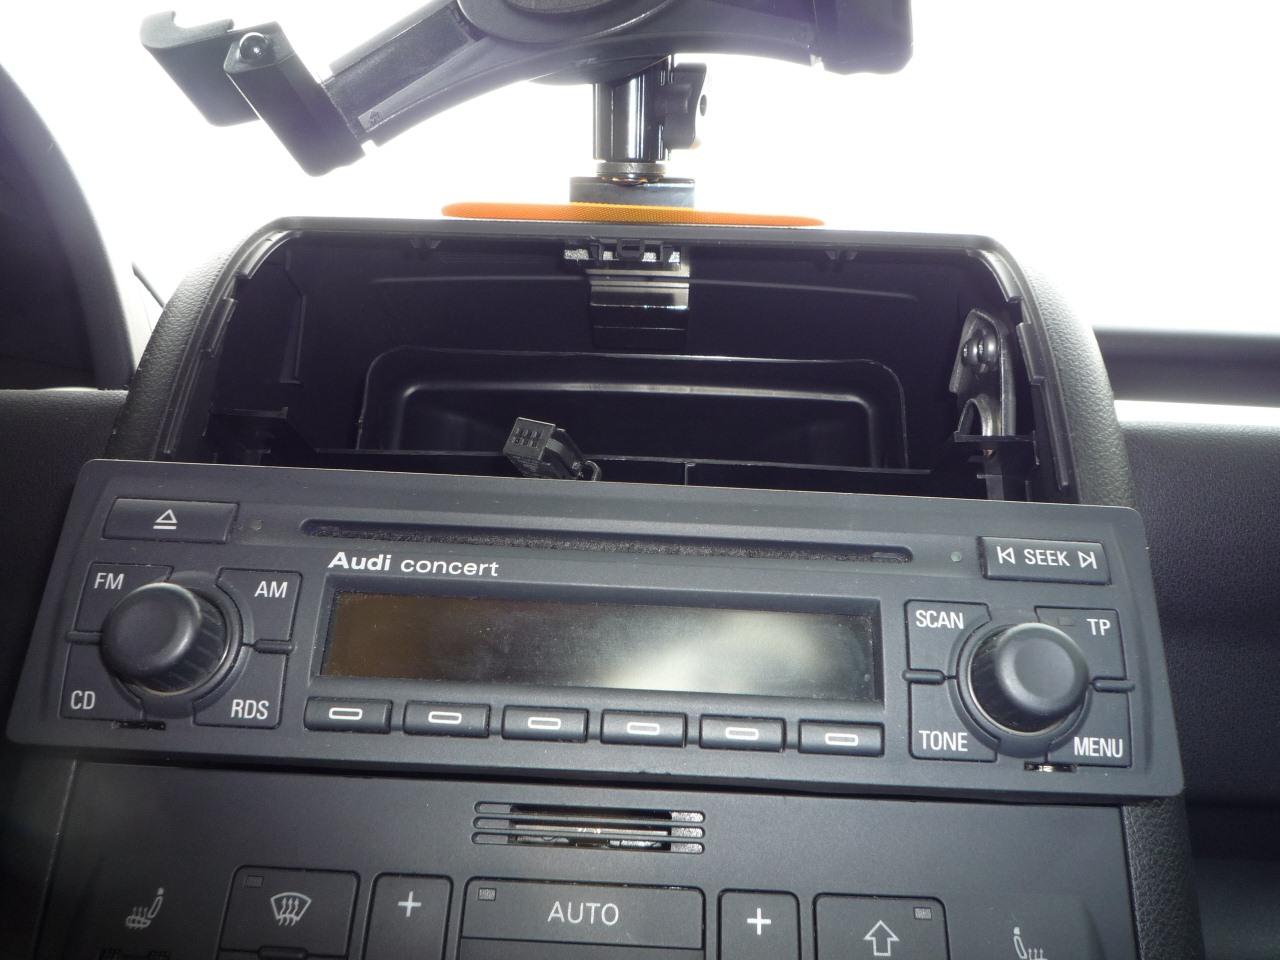 CAR-UMPC-Projekt_Neodym.JPG.5d5af49588fd7519f58d83c3dfdf1d24.JPG